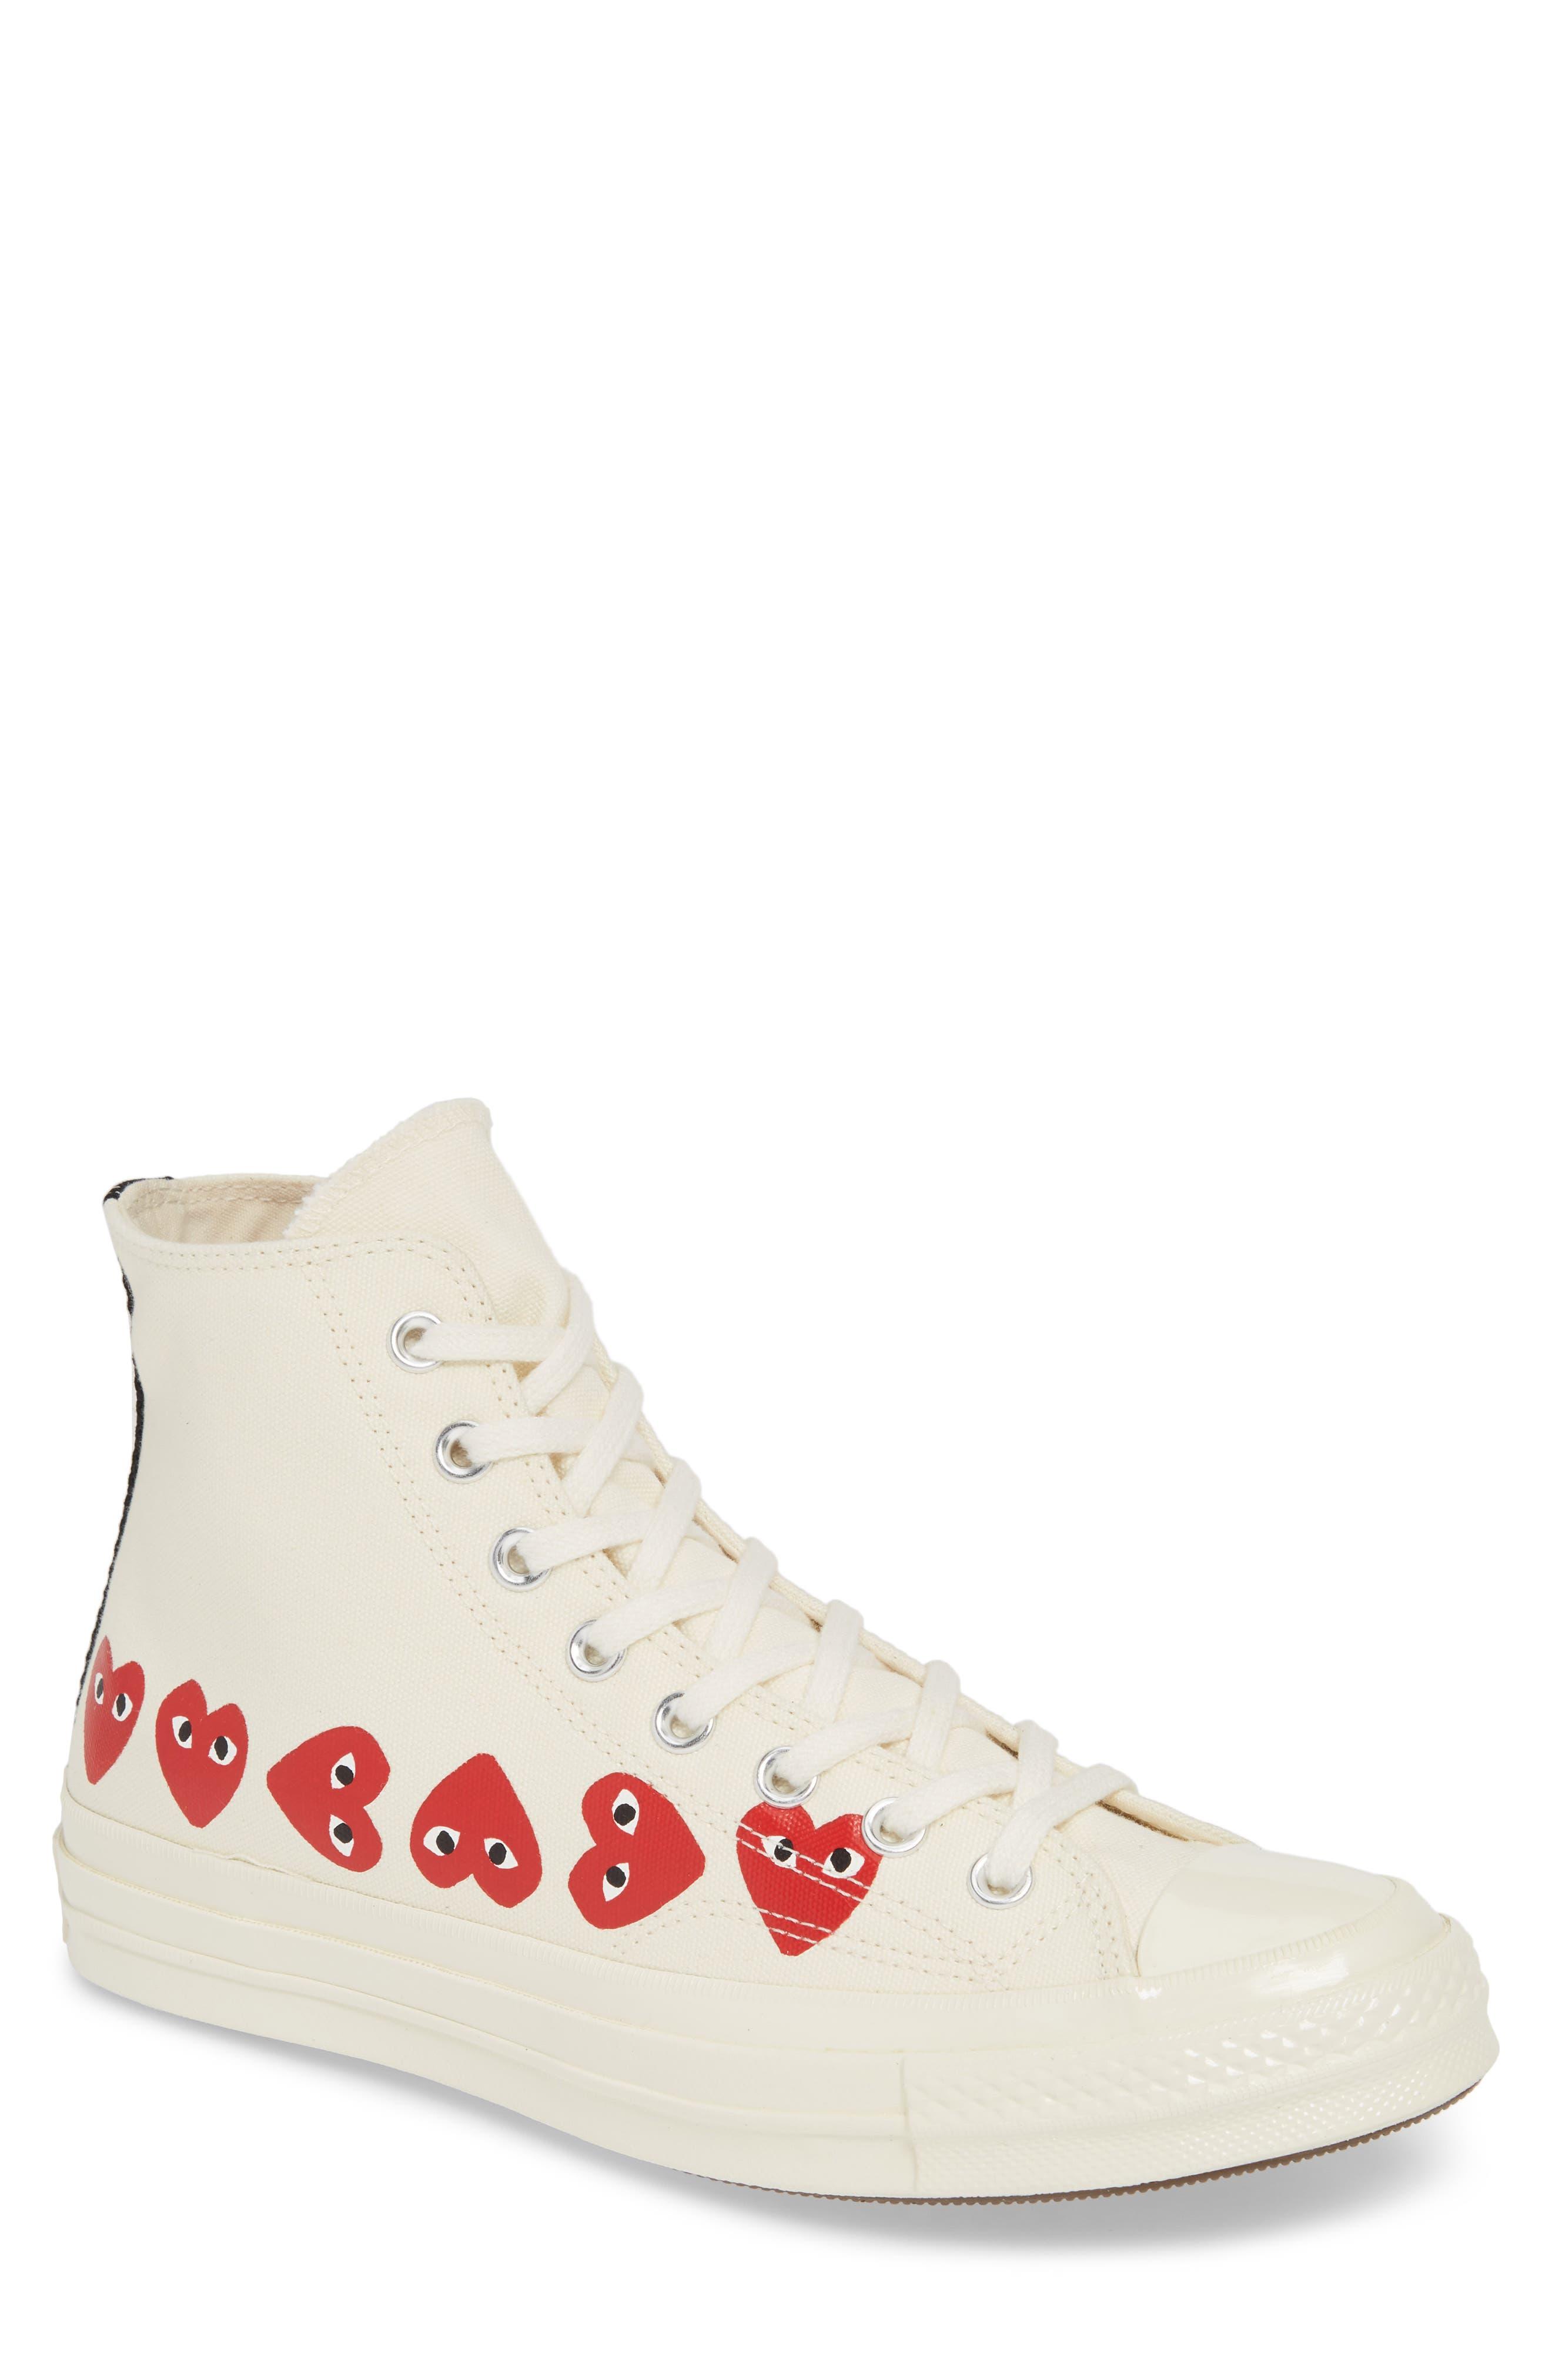 Multiheart Sneaker, Main, color, OFF WHITE